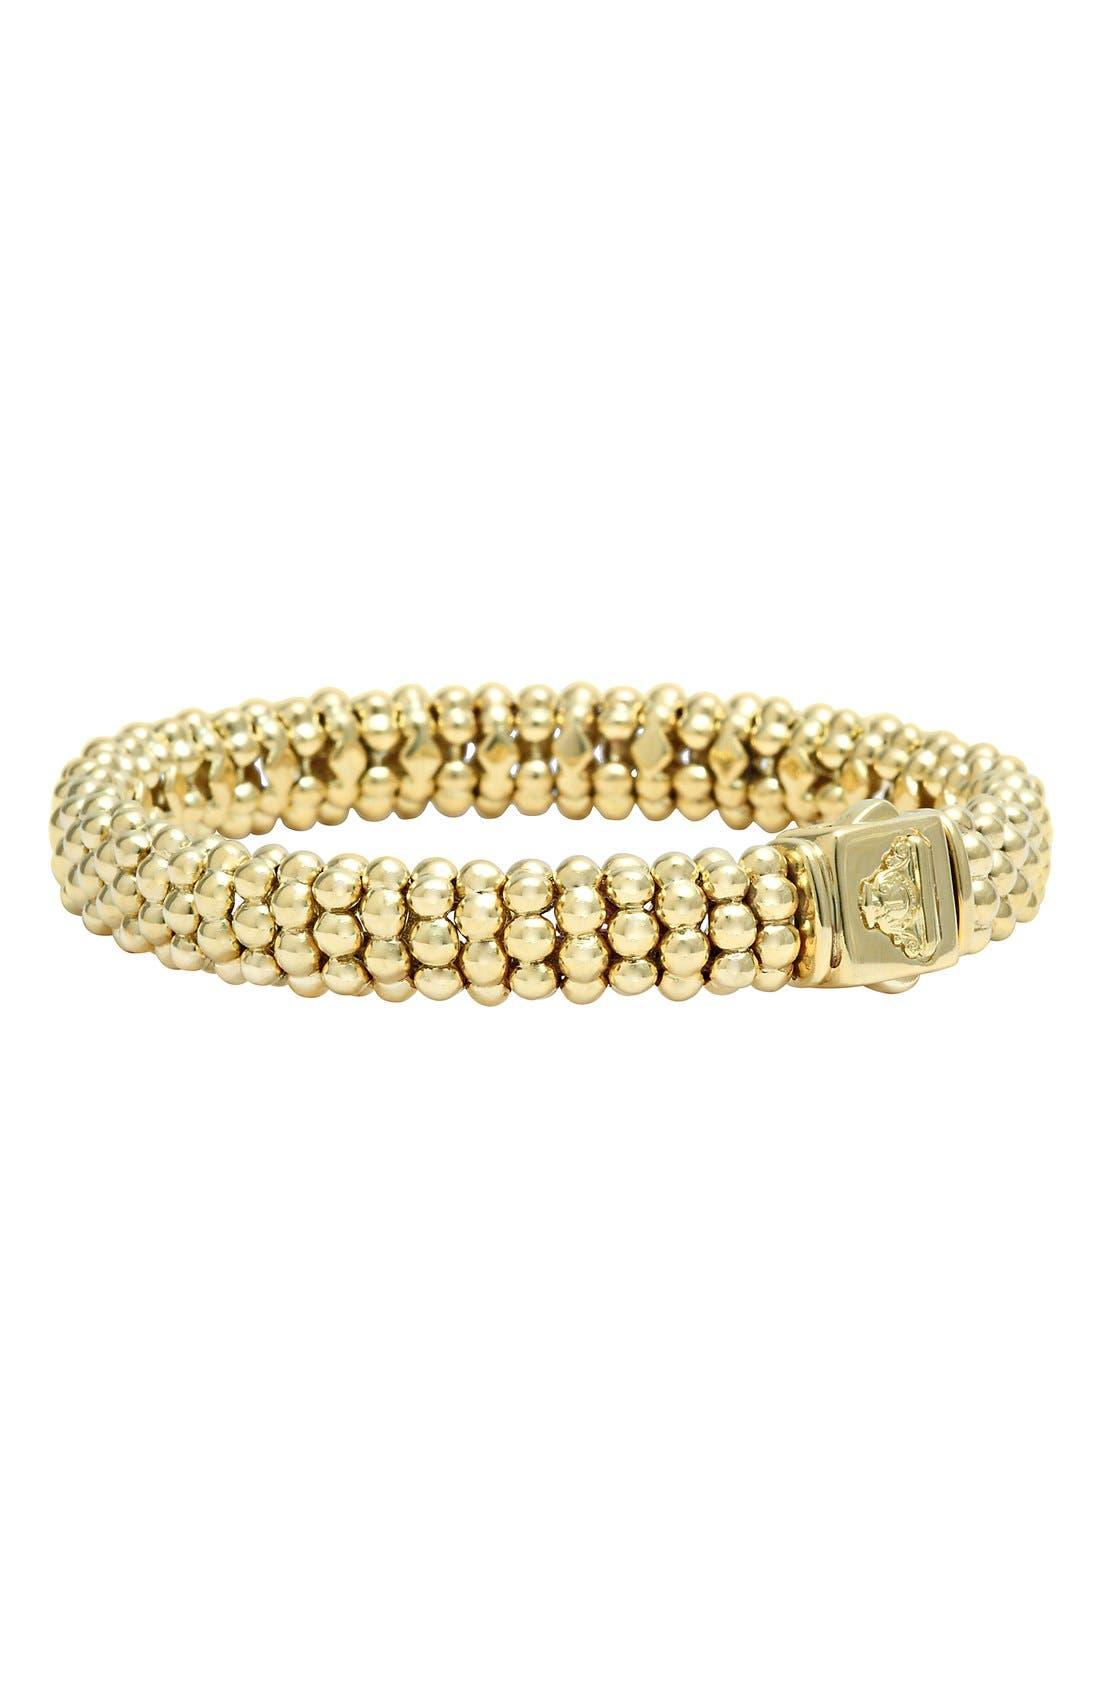 'Caviar Gold' Rope Bracelet,                             Alternate thumbnail 8, color,                             GOLD